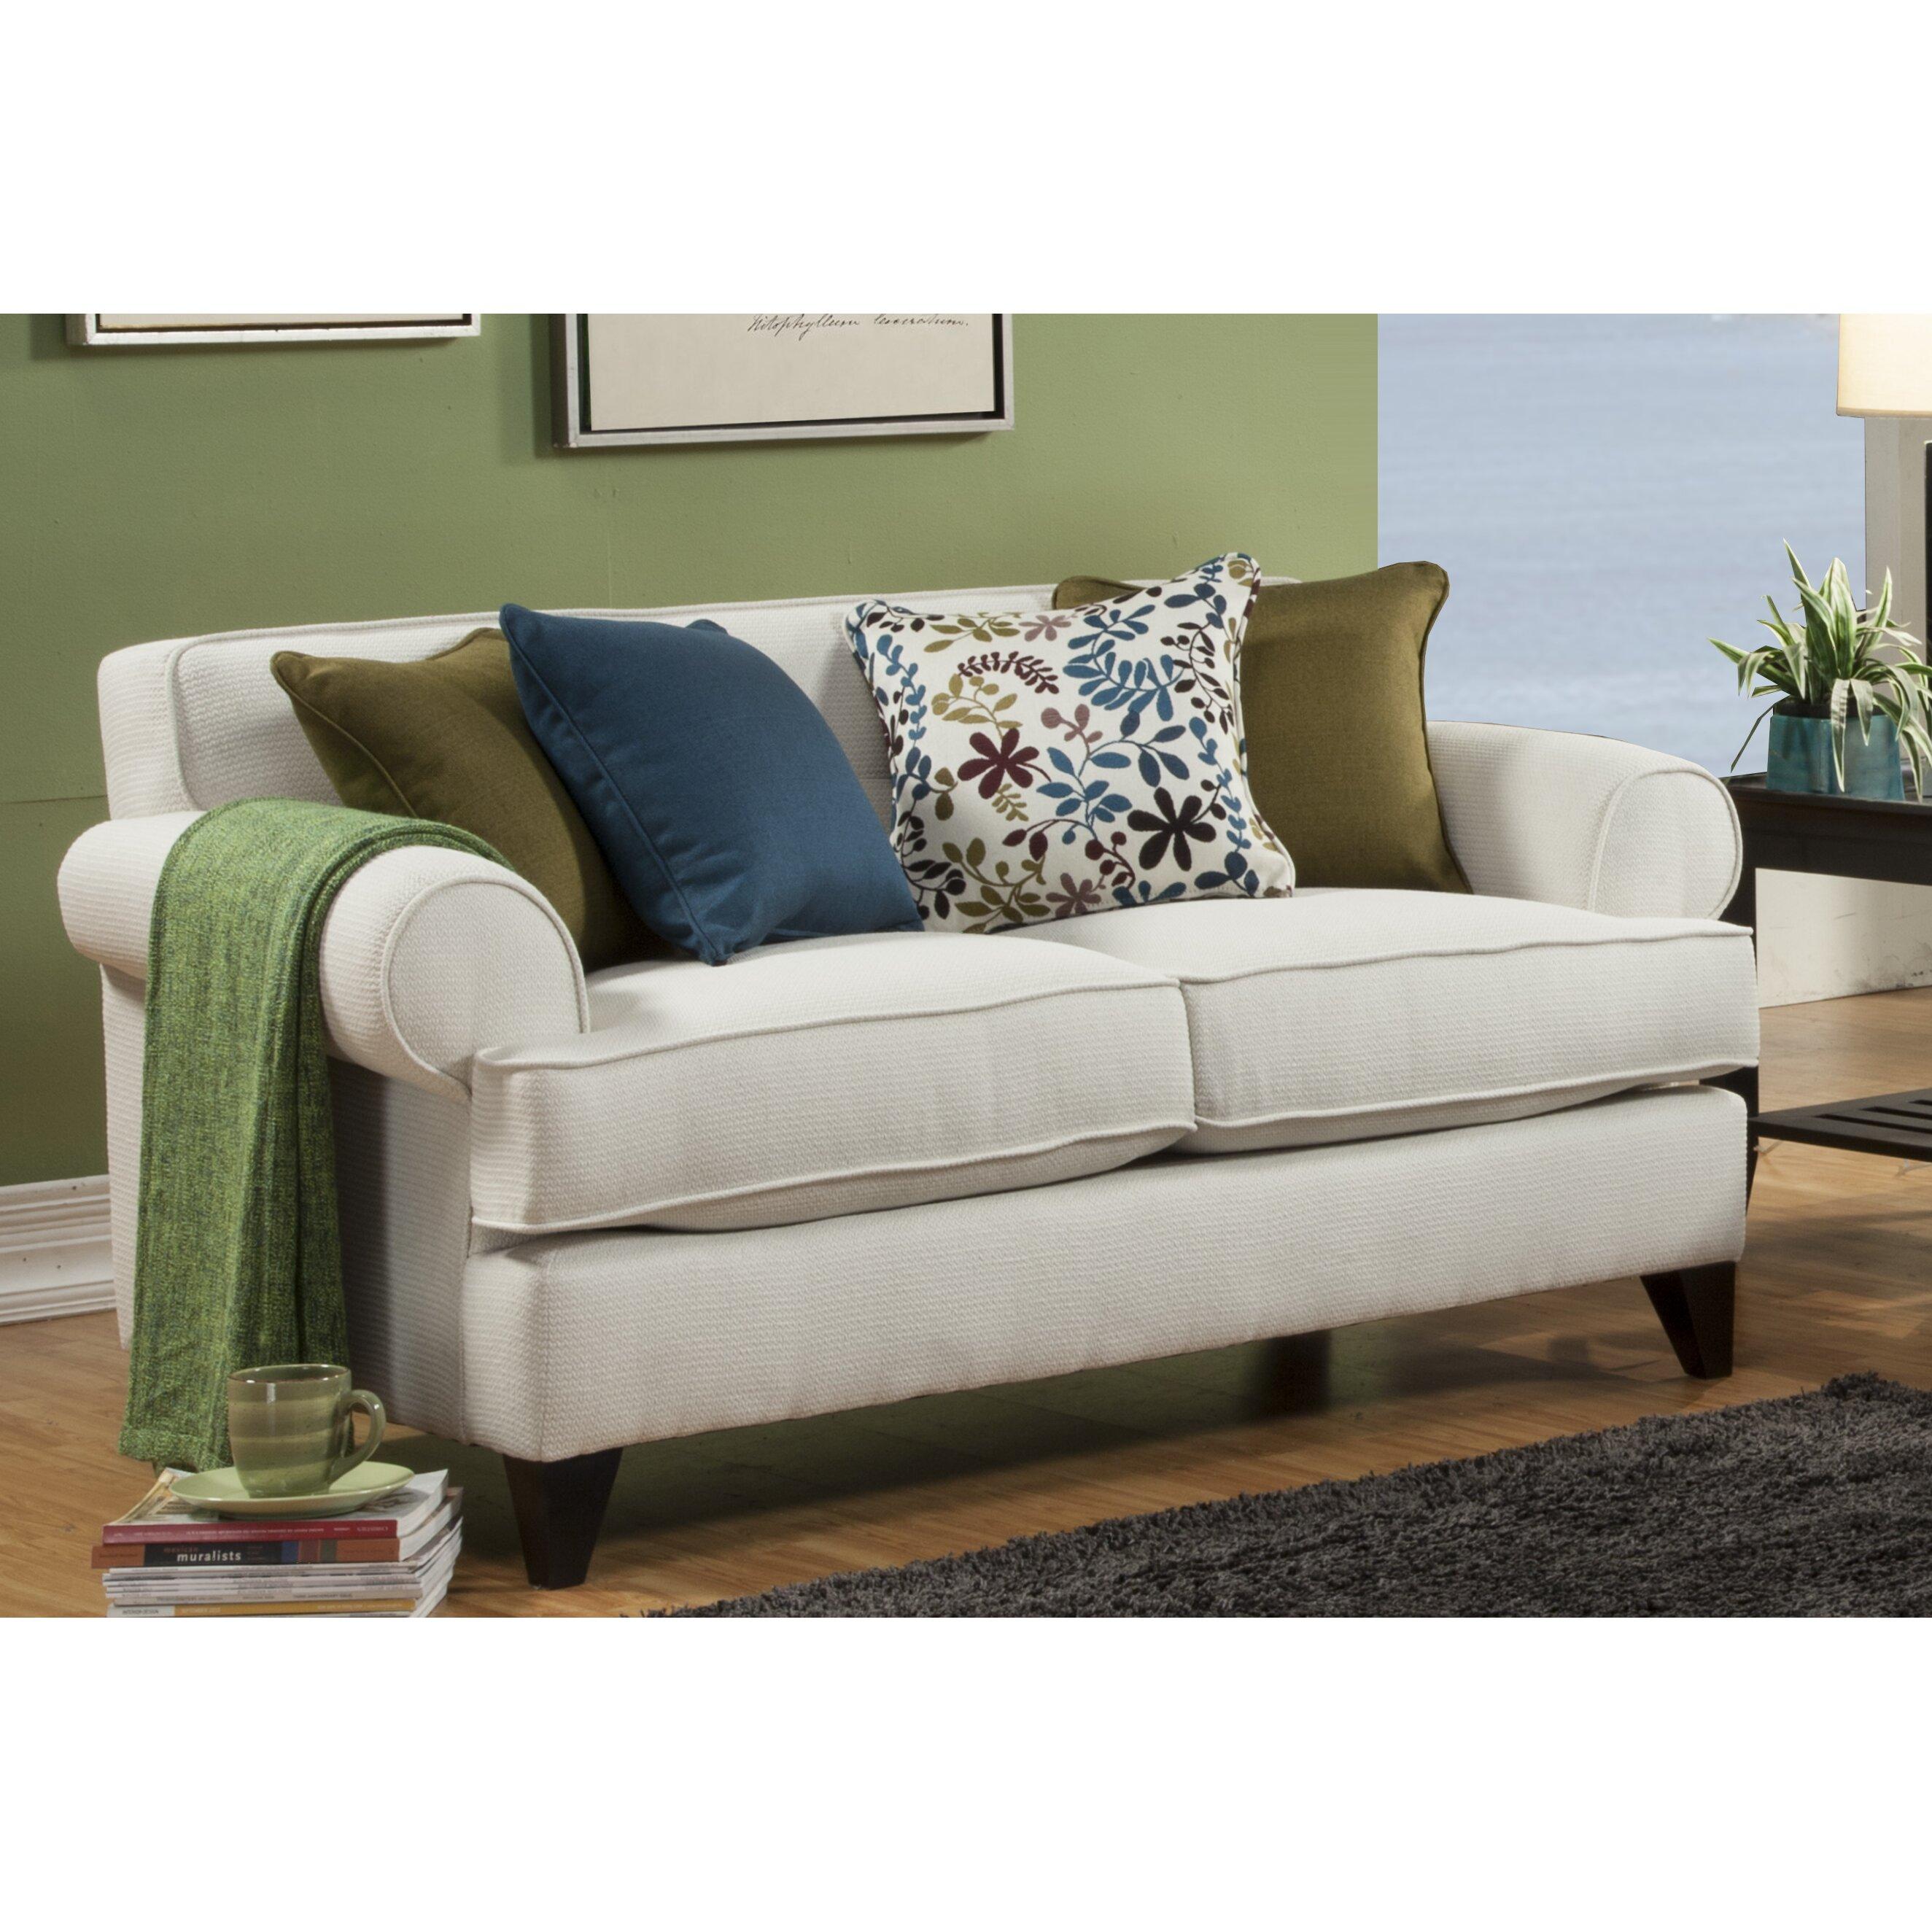 Hokku designs nevis living room collection reviews wayfair for Hokku designs living room furniture